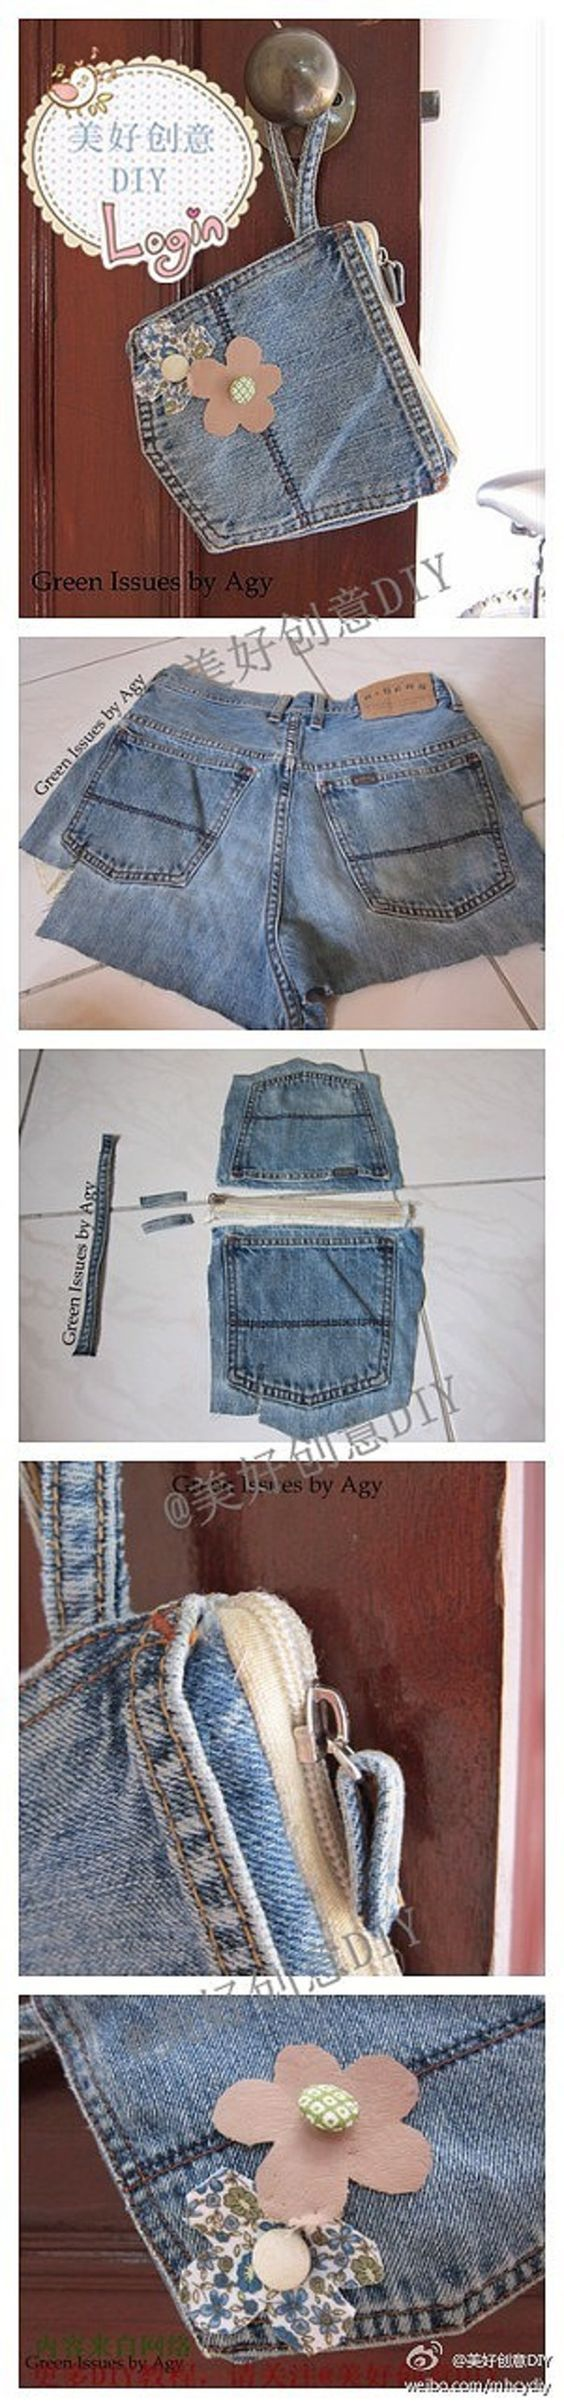 Recyclage vieux jeans: